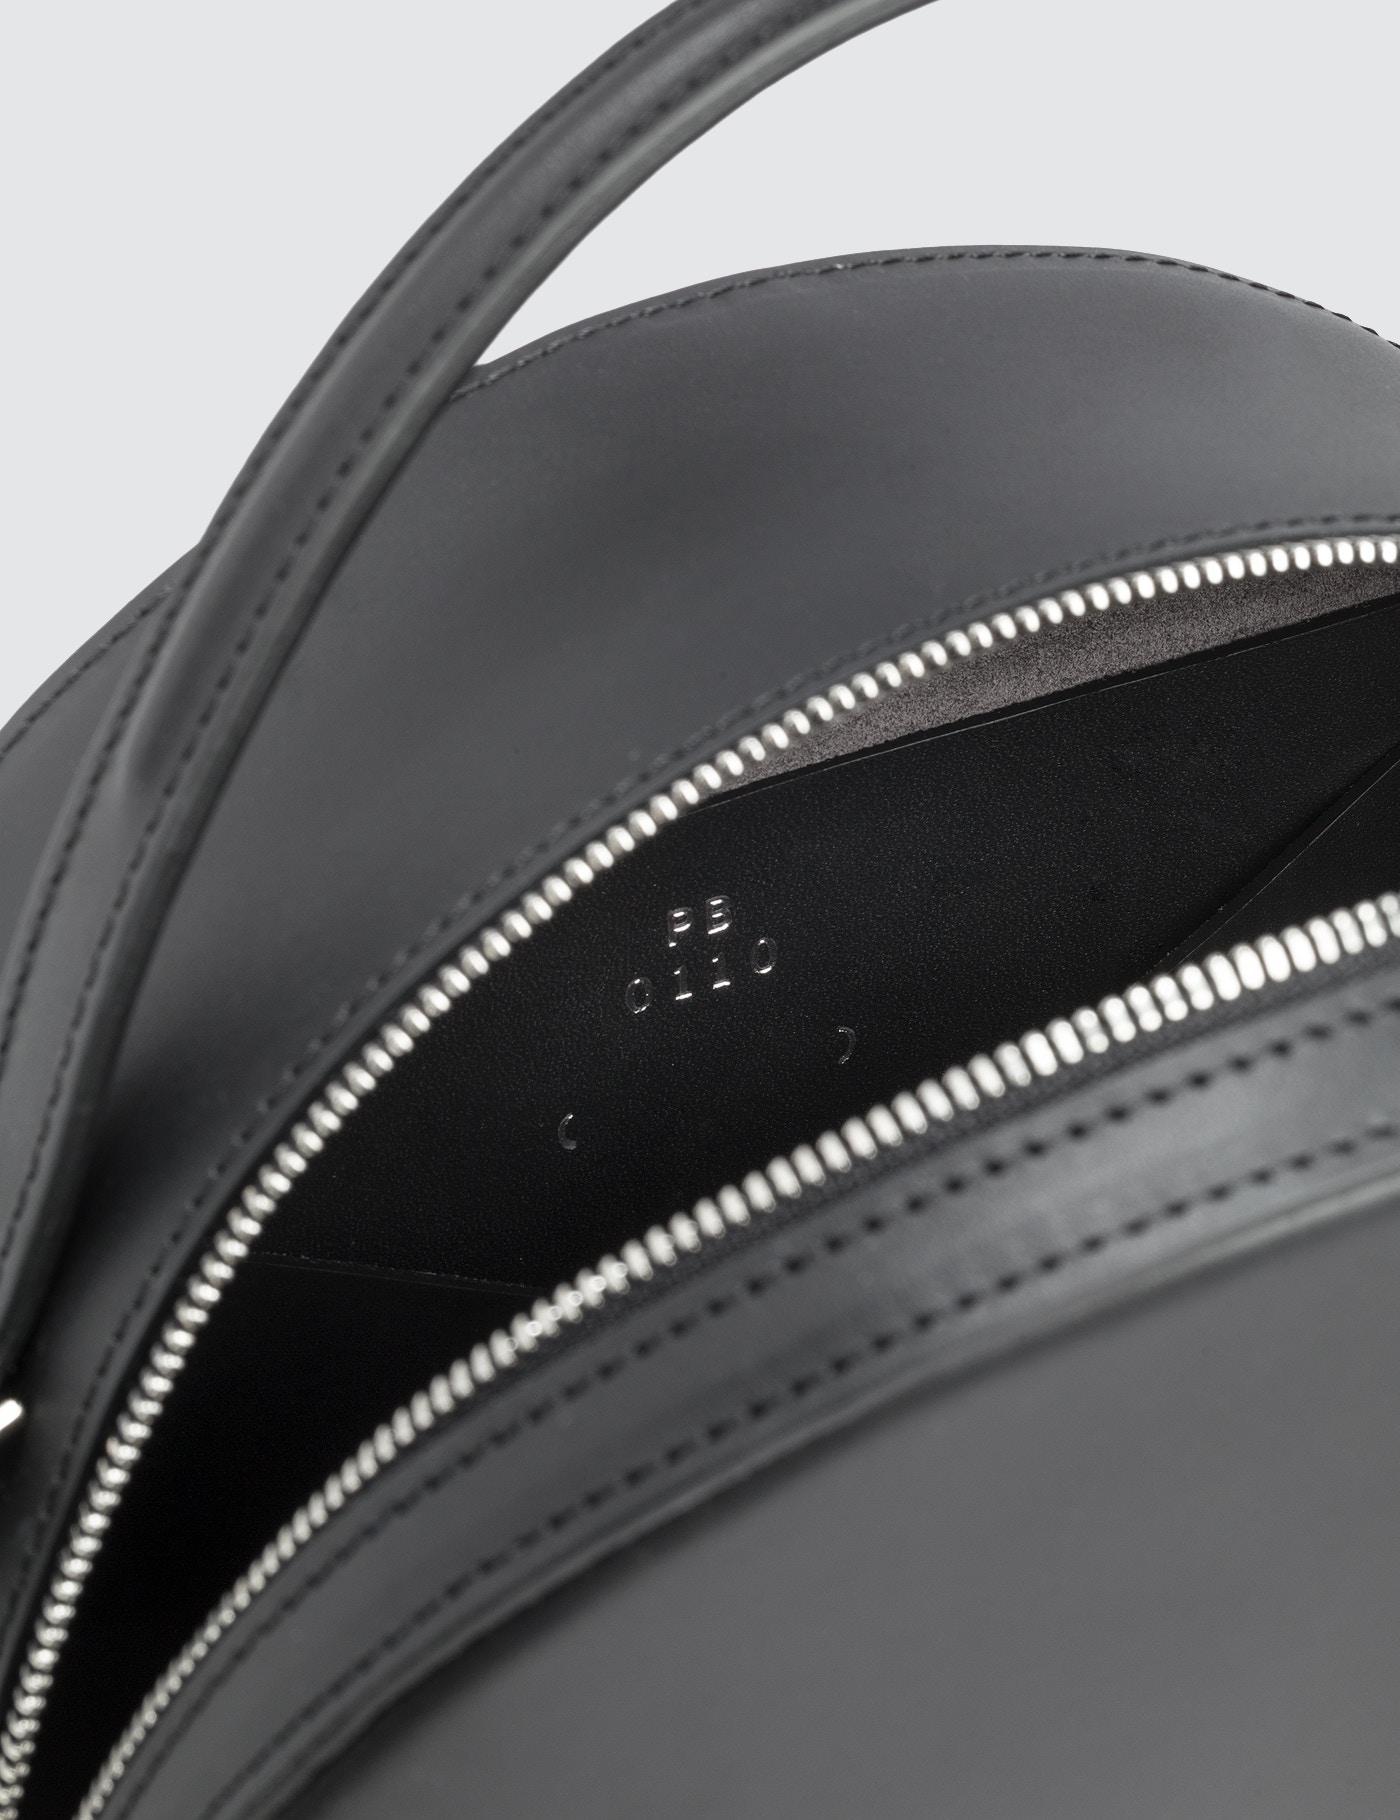 PB 0110 Leather Round Cross-body Bag in Black